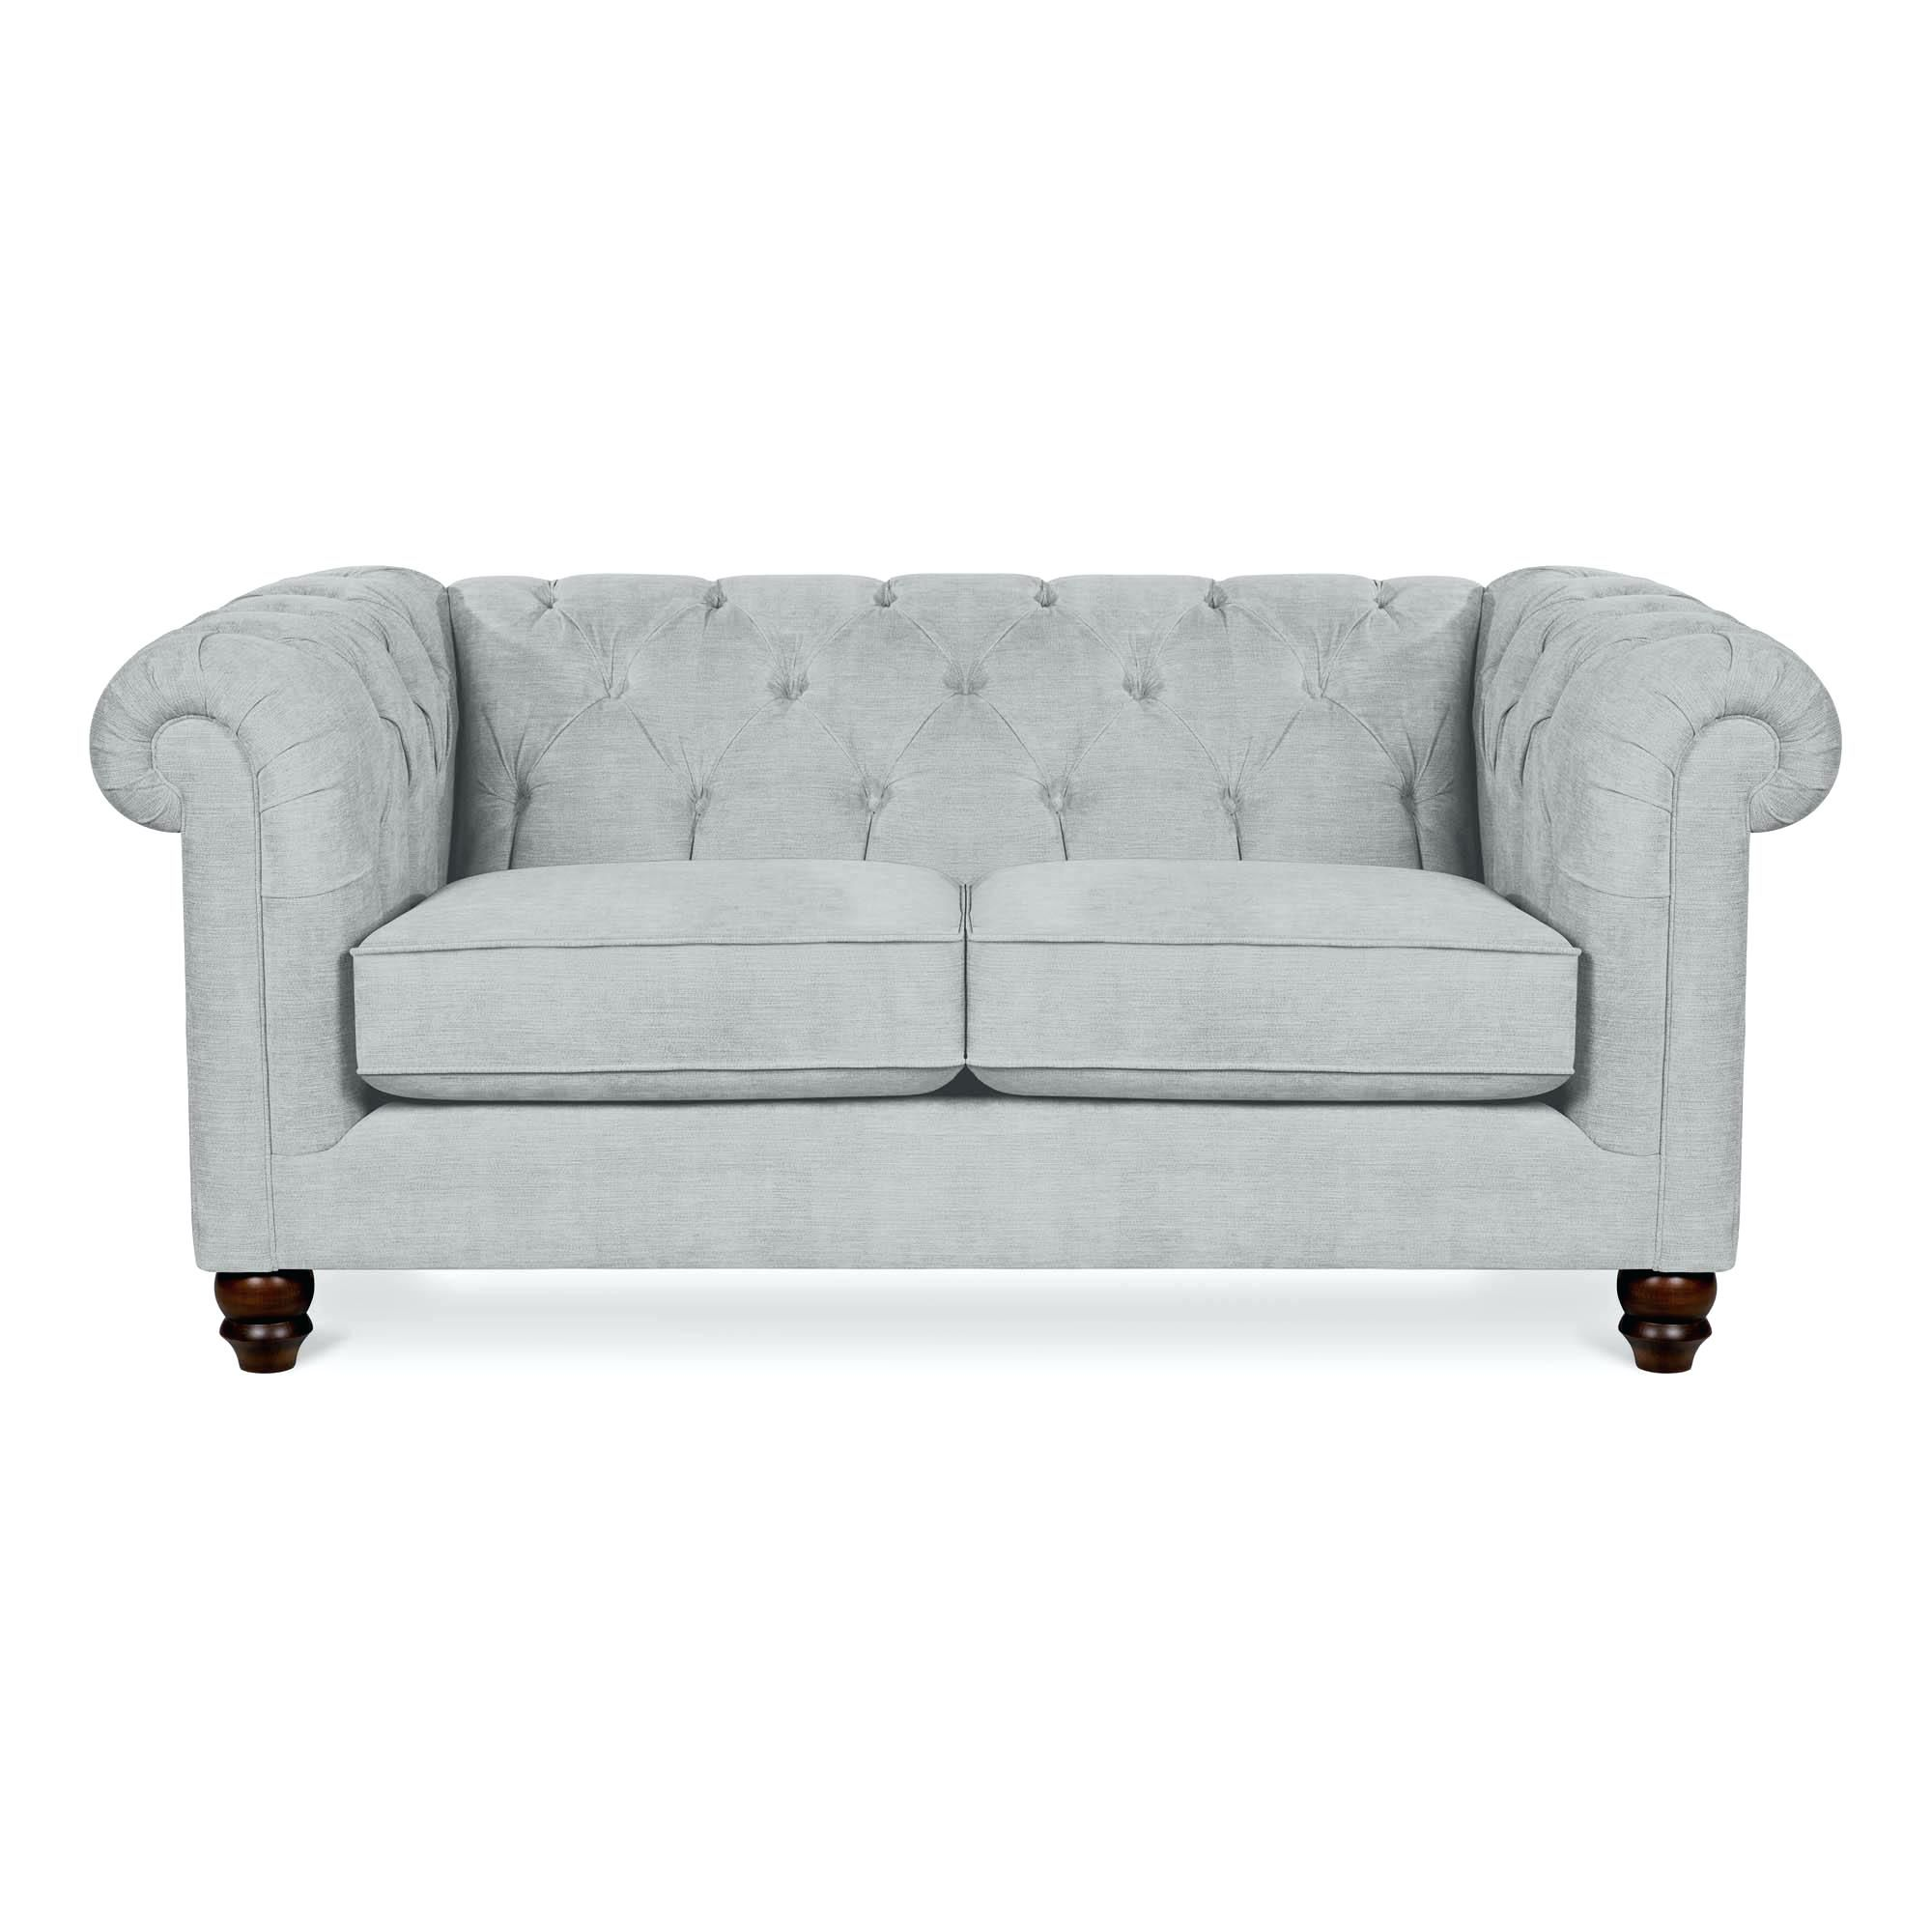 2 Seater Sofa 2 Seater Sofa Seater Sofa Sofa